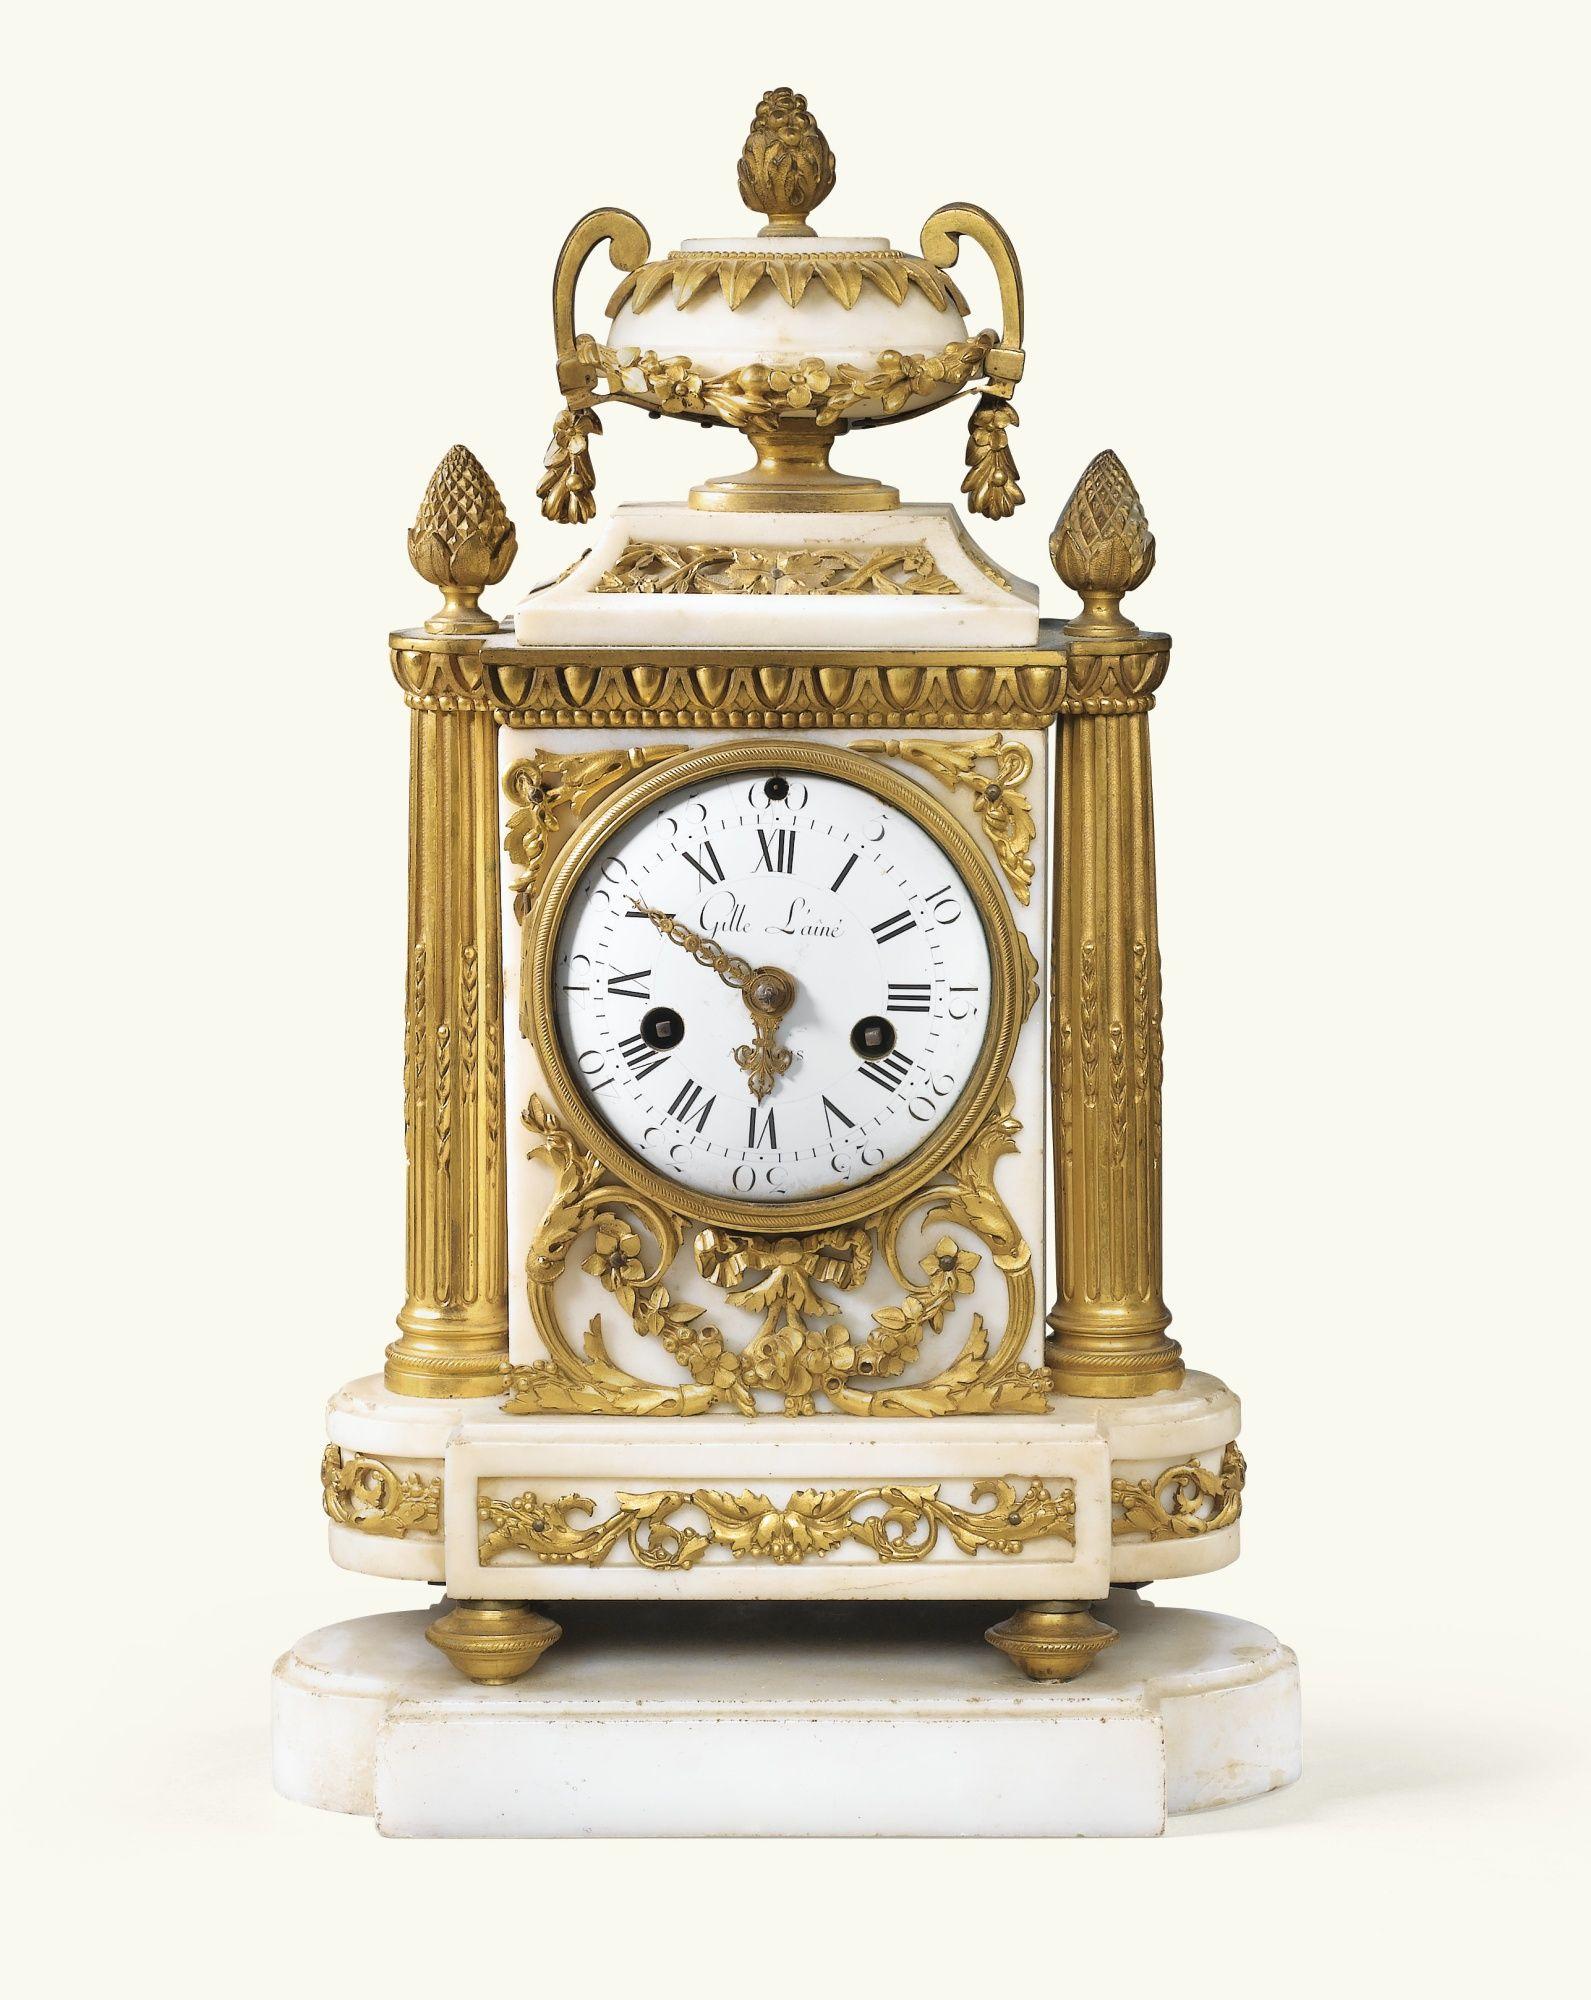 Pendule Borne En Marbre Blanc Et Bronze Dore D Epoque Louis Xvi Le Cadran Signe Em Gille L Ai Antique Wall Clocks Antique Pendulum Wall Clock Antique Clocks